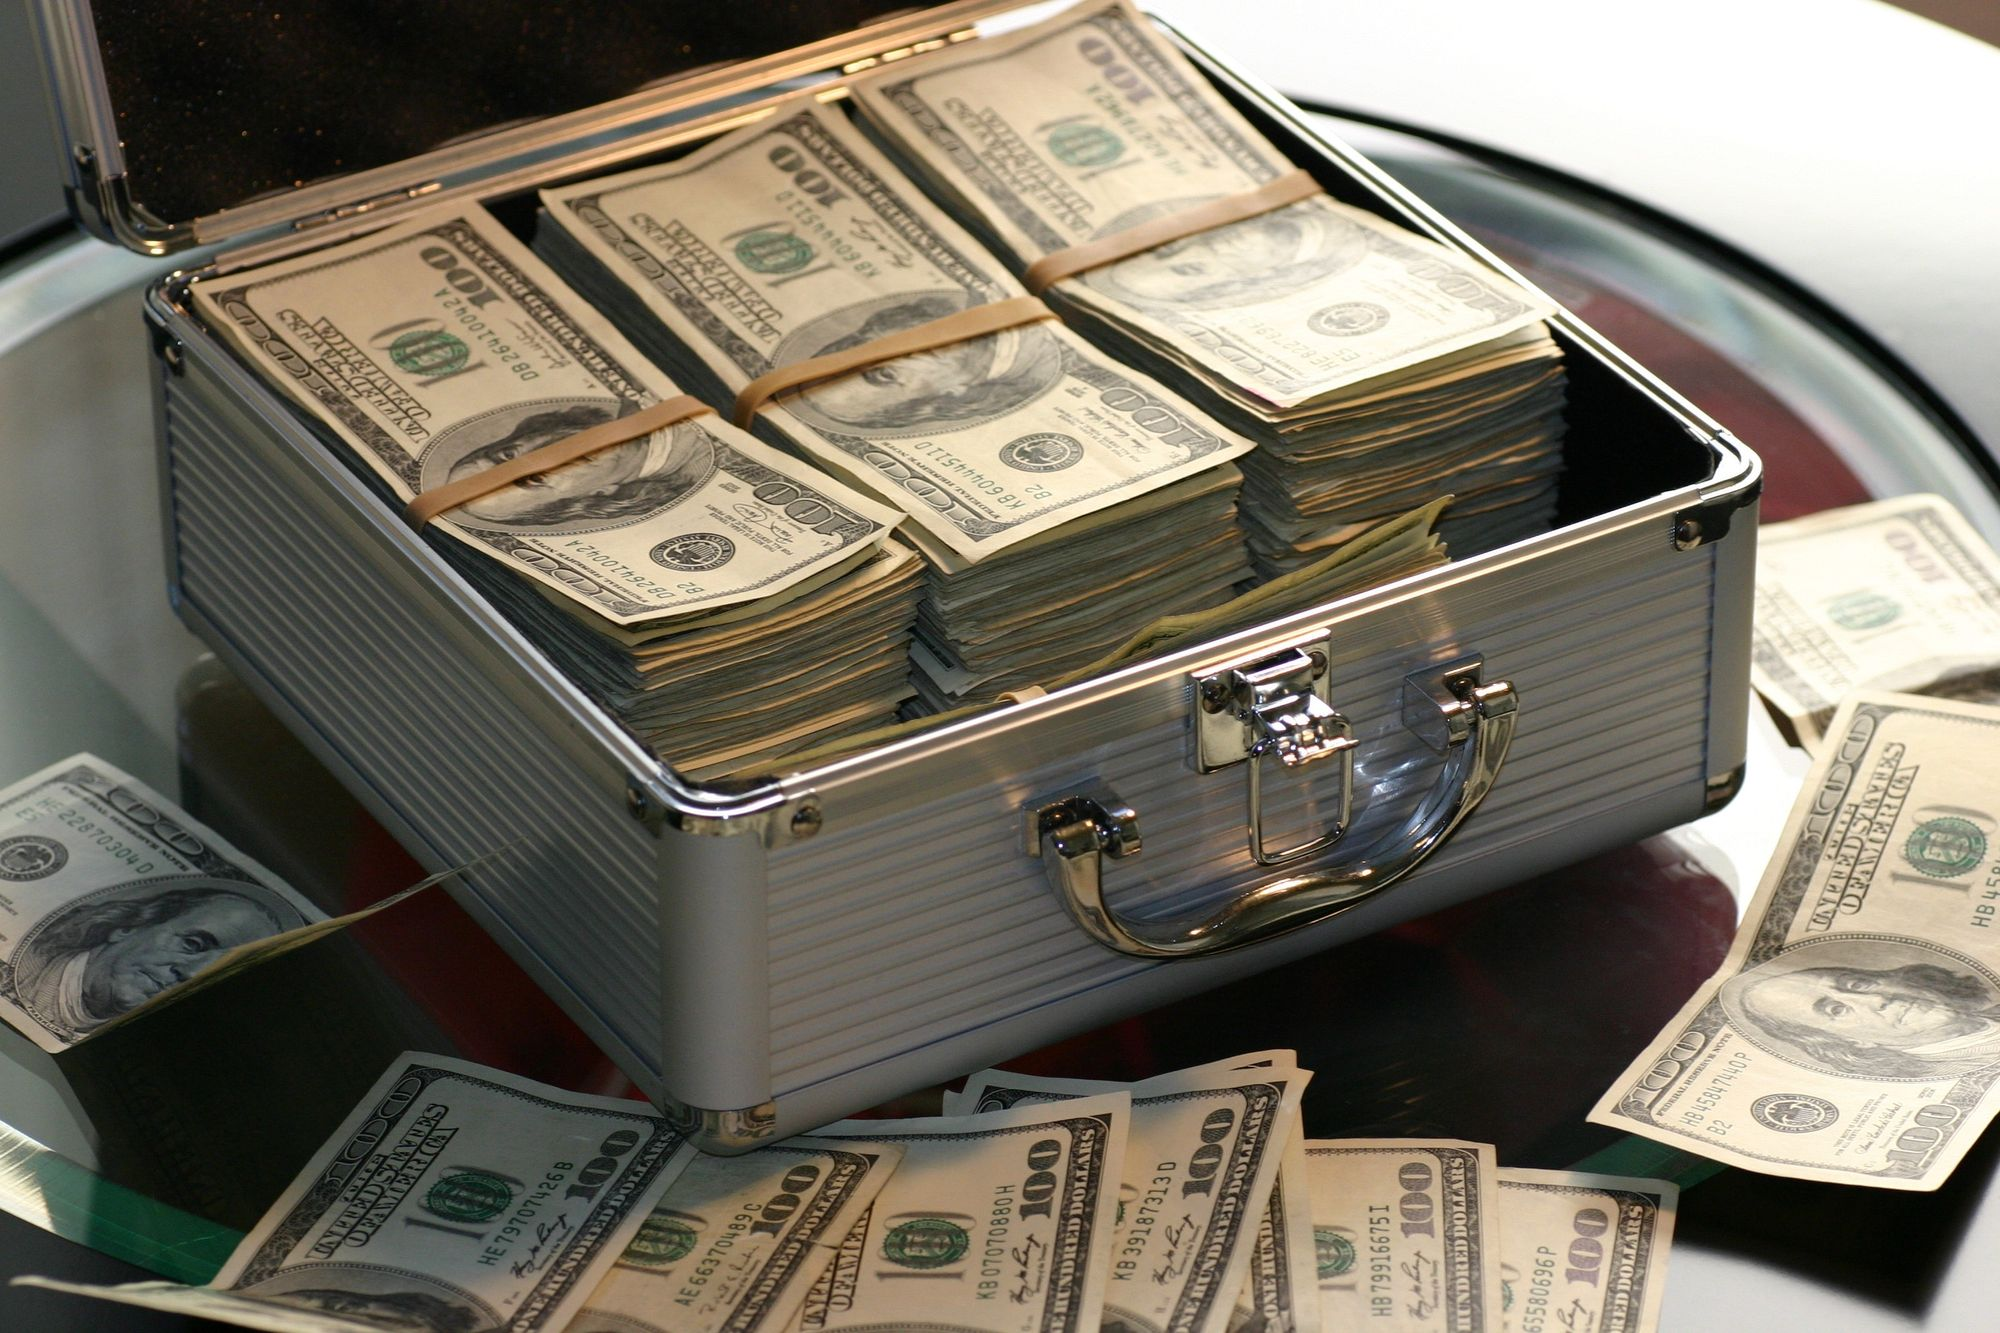 Bootstrapped founder vs Funded entrepreneur: The Ultimate Showdown